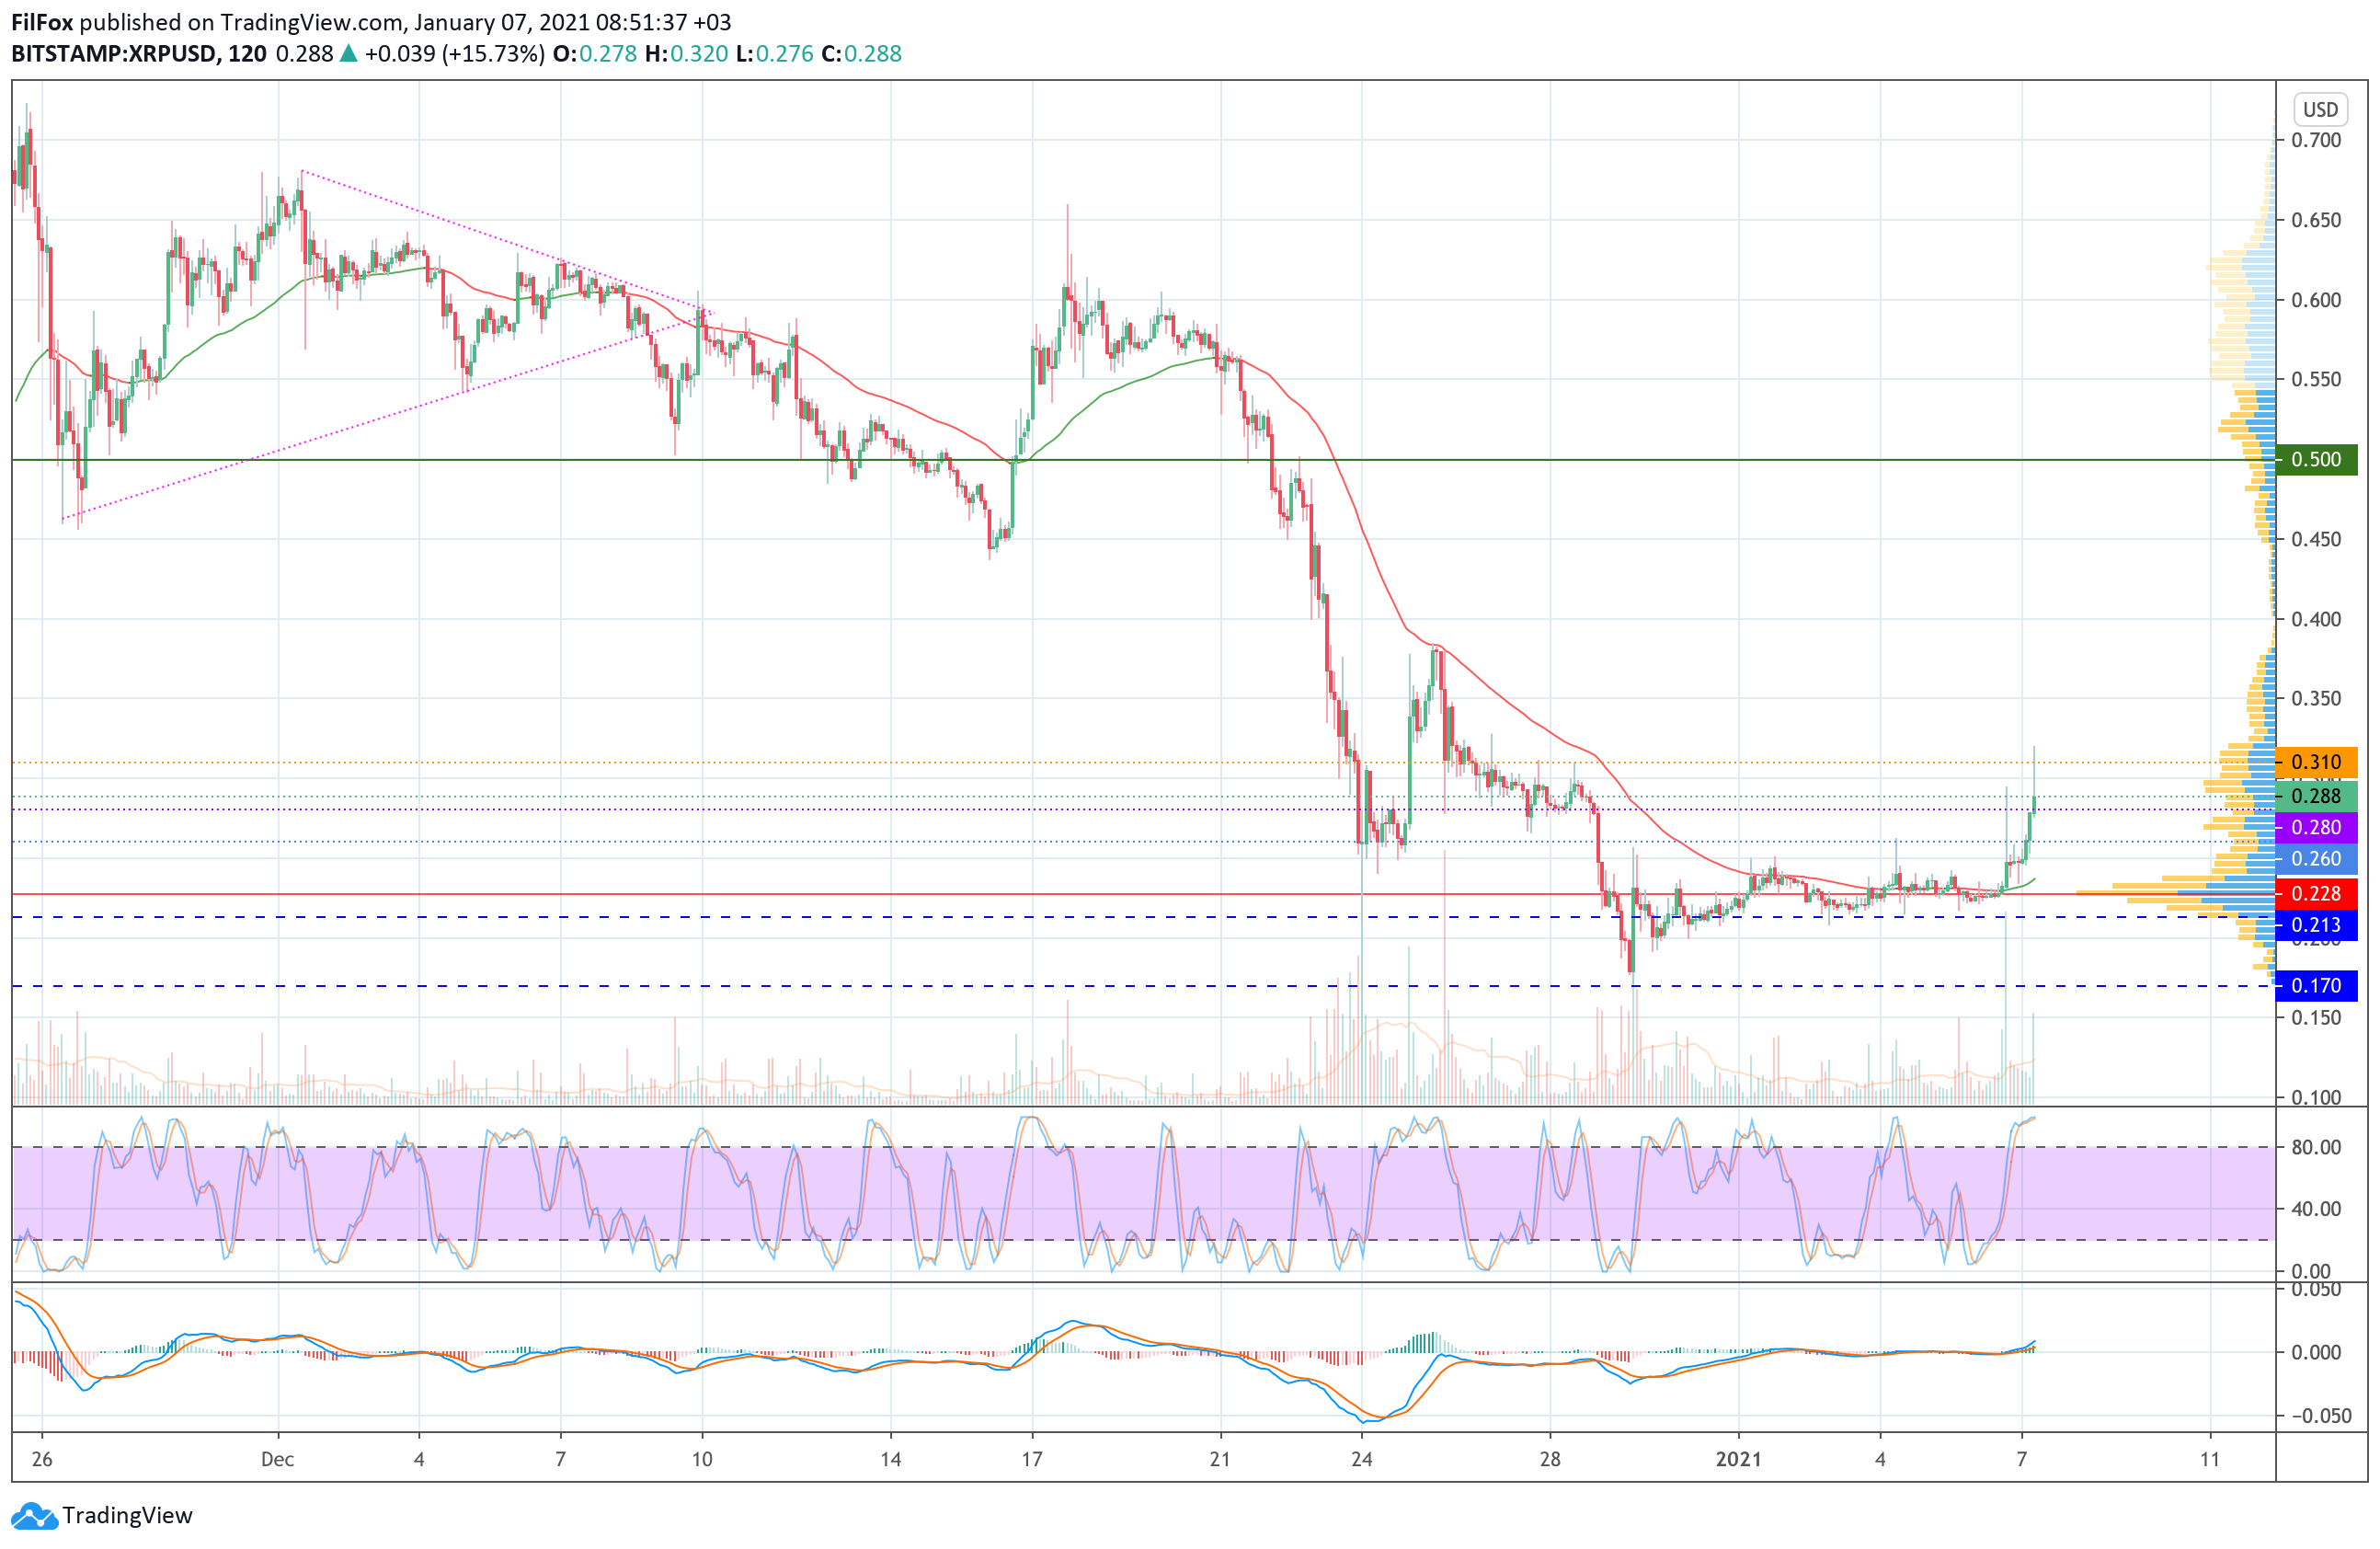 Анализ цен Bitcoin, Ethereum, Ripple на 07.01.2021